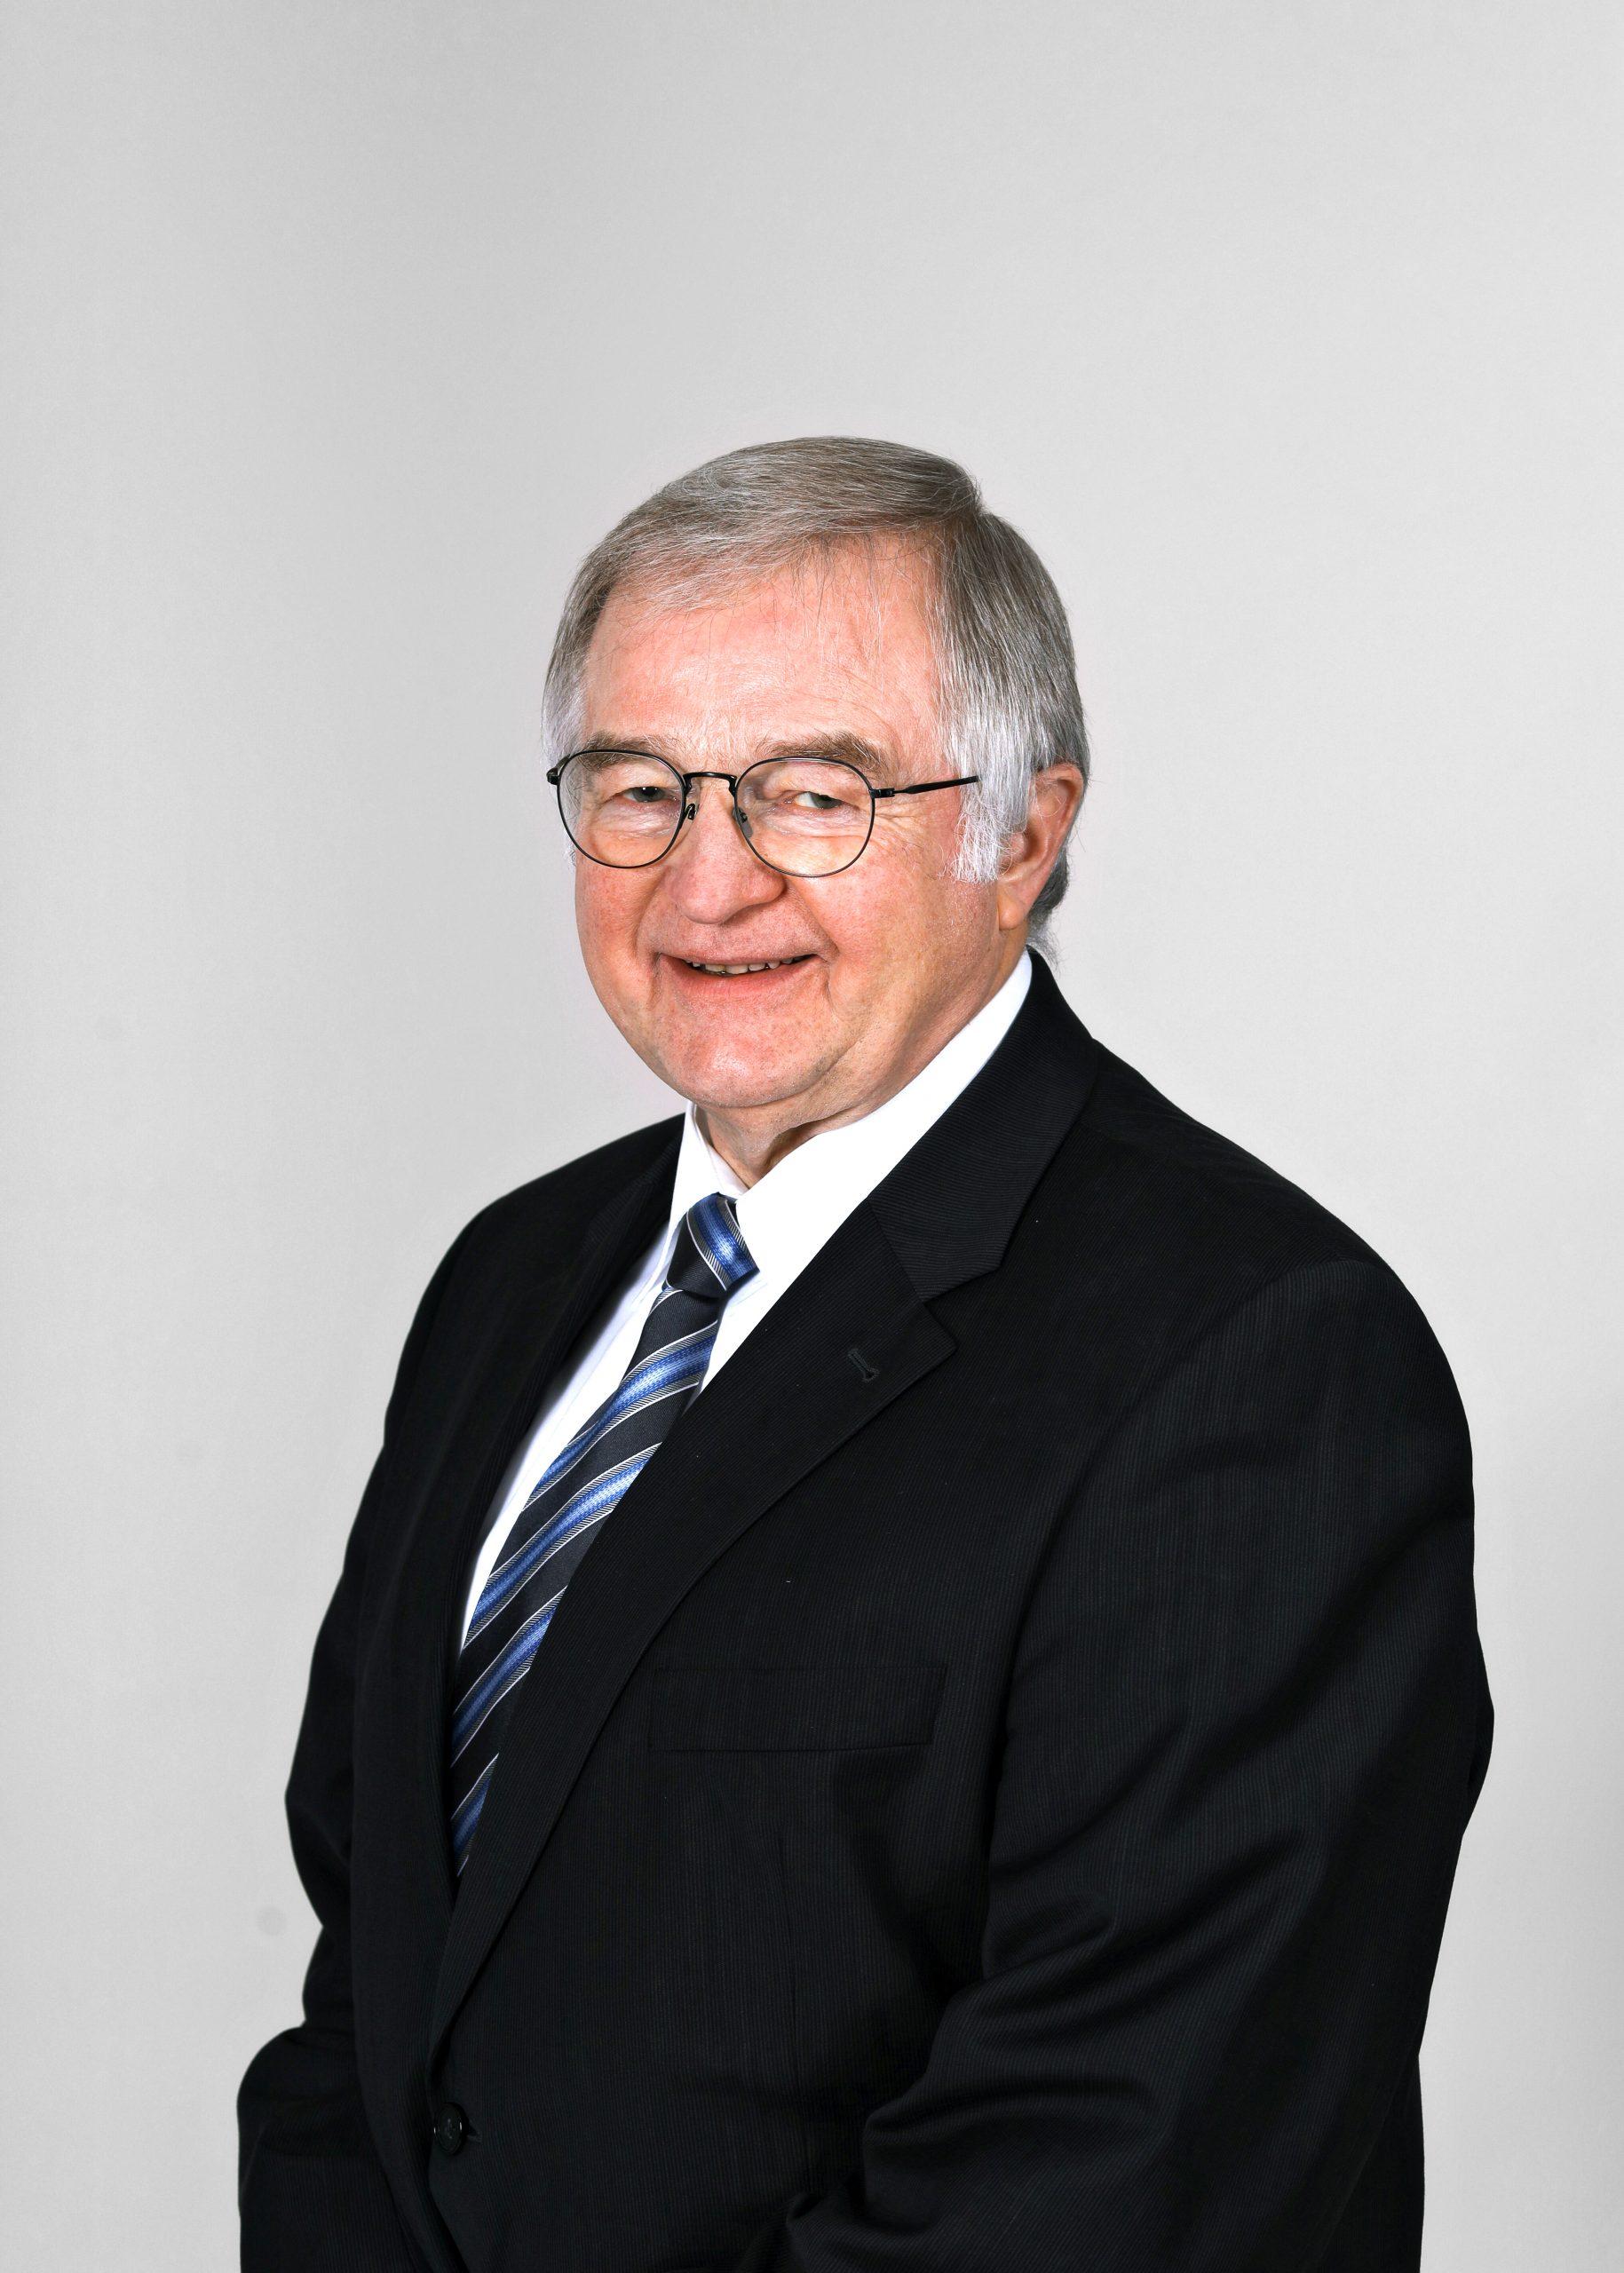 Leo Schnaubelt